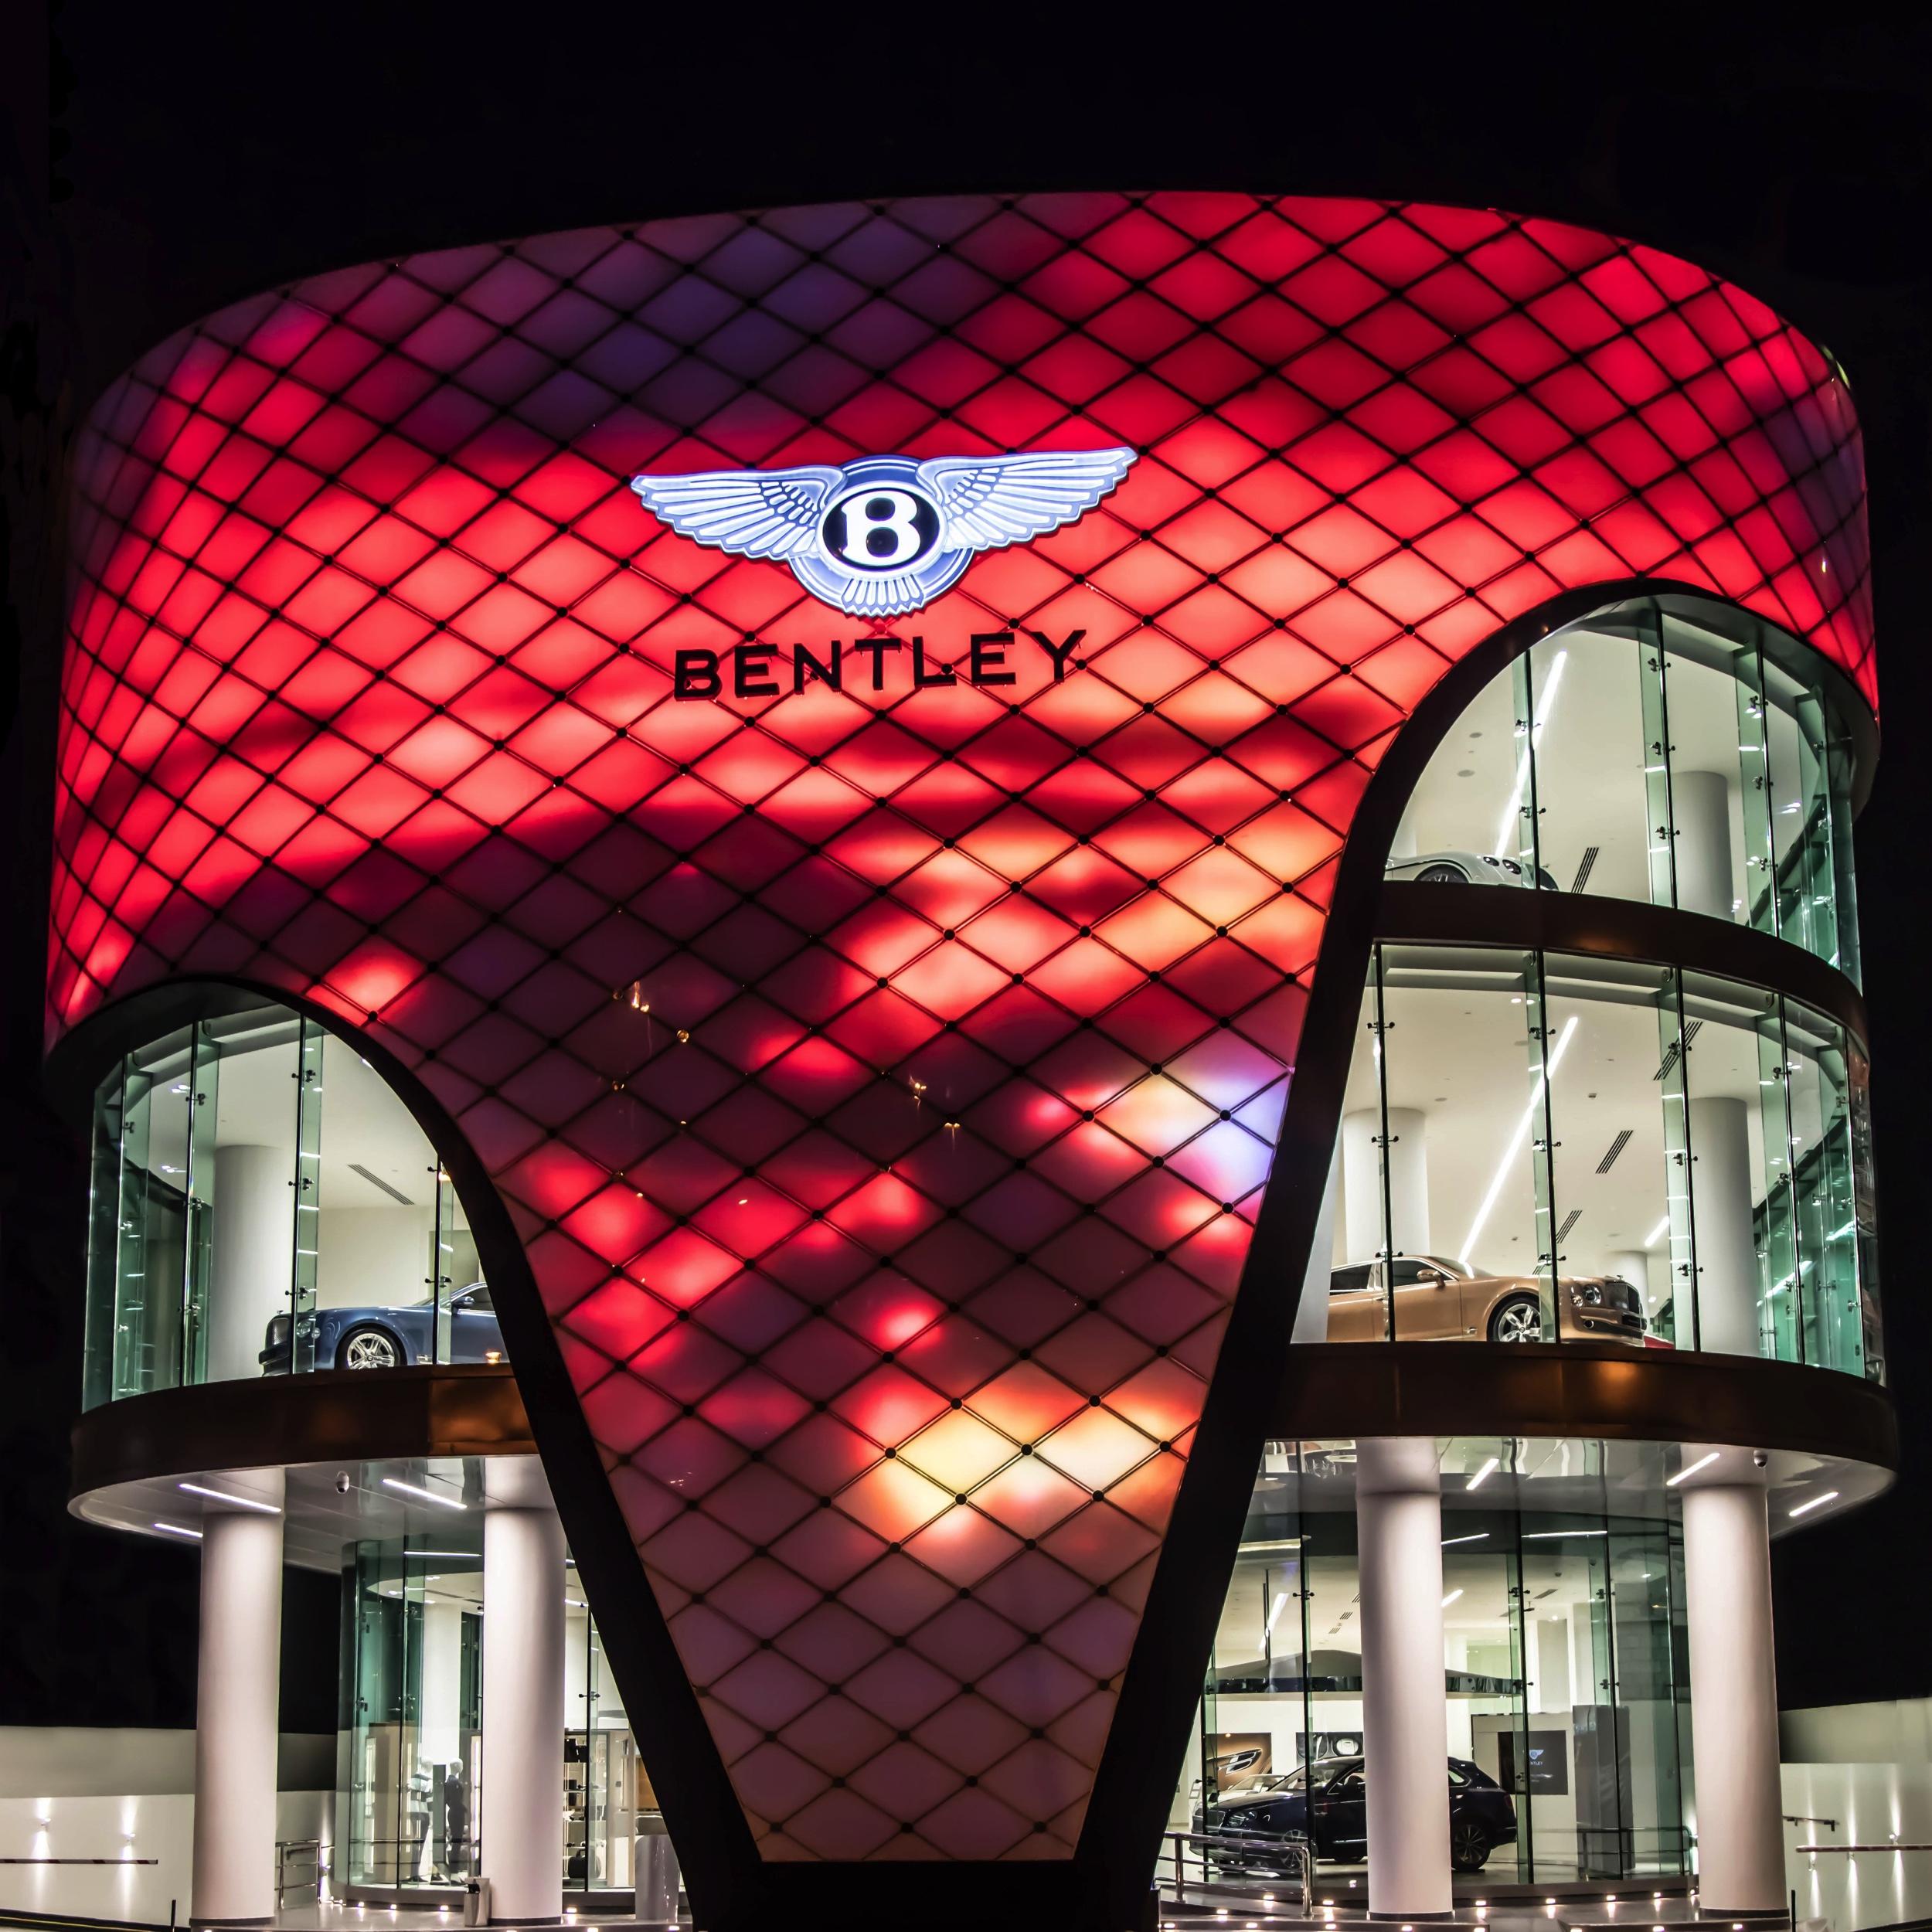 Bentley Showroom Dubai -2- Autovisie.nl